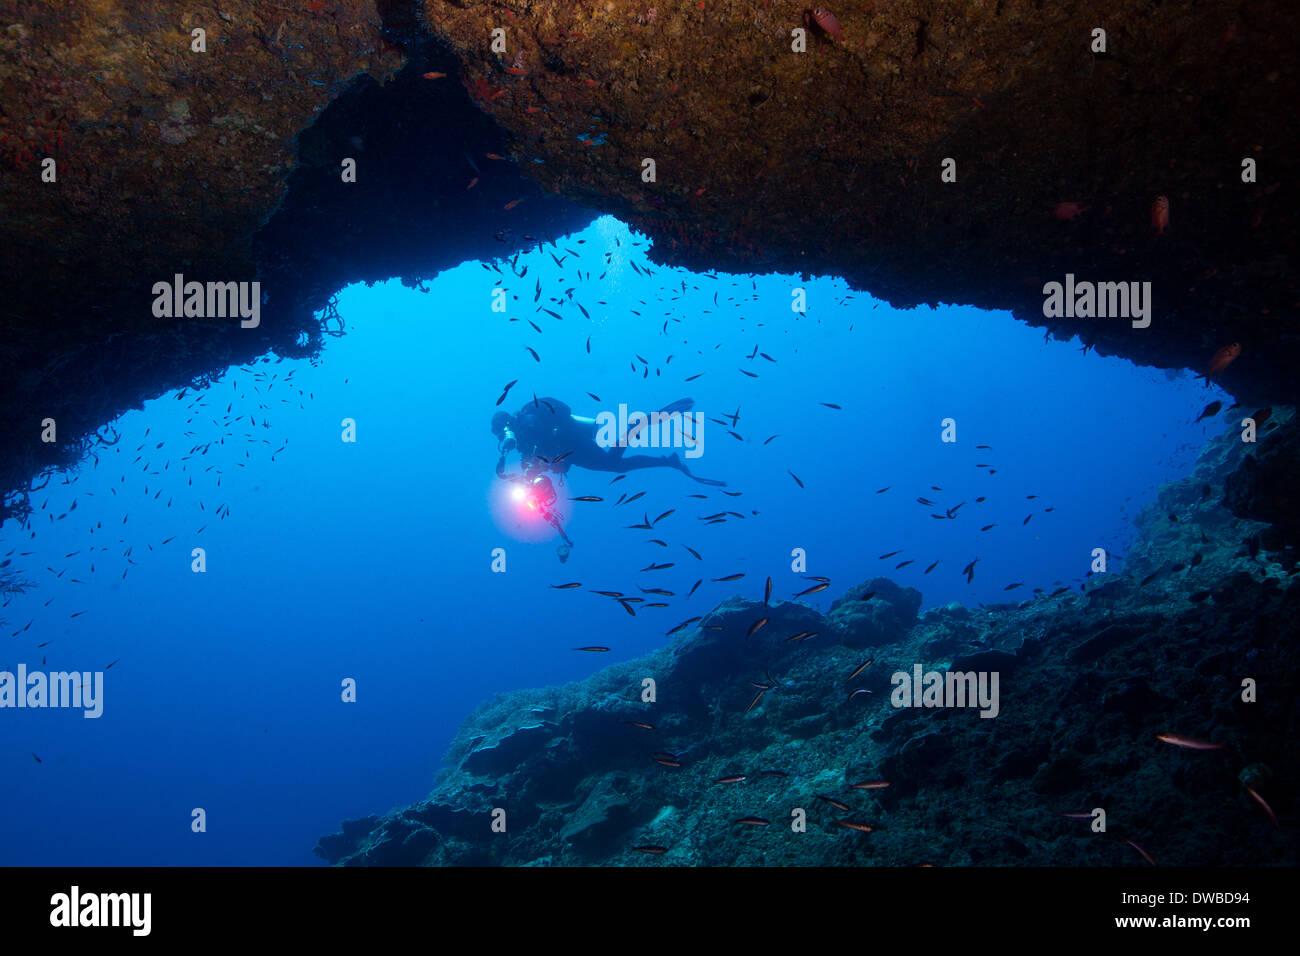 Umrahmt von Cavern Diver. Stockbild